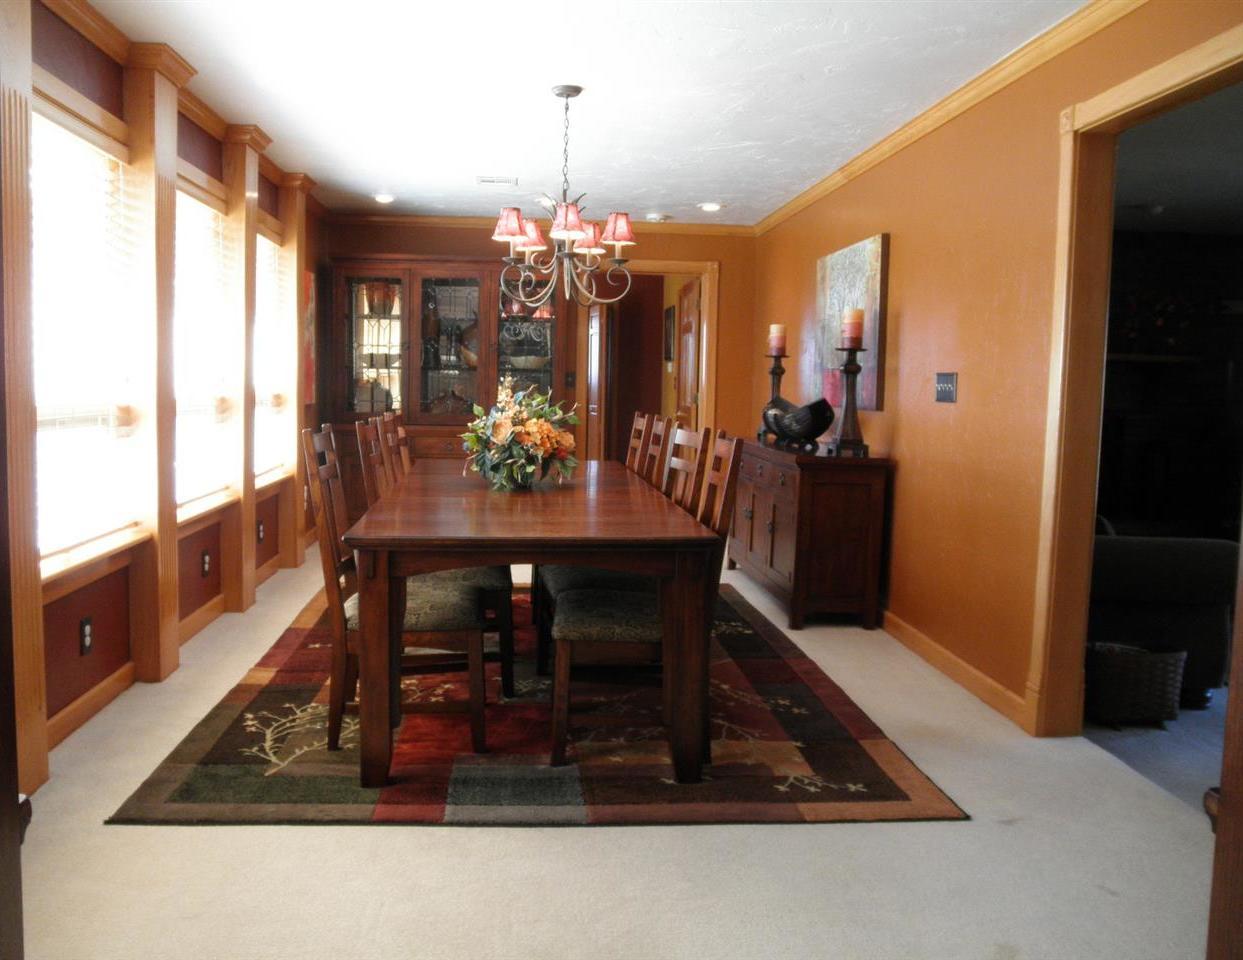 Sold Intraoffice W/MLS | 7038 River Ridge Drive  Ponca City, OK 74604 5